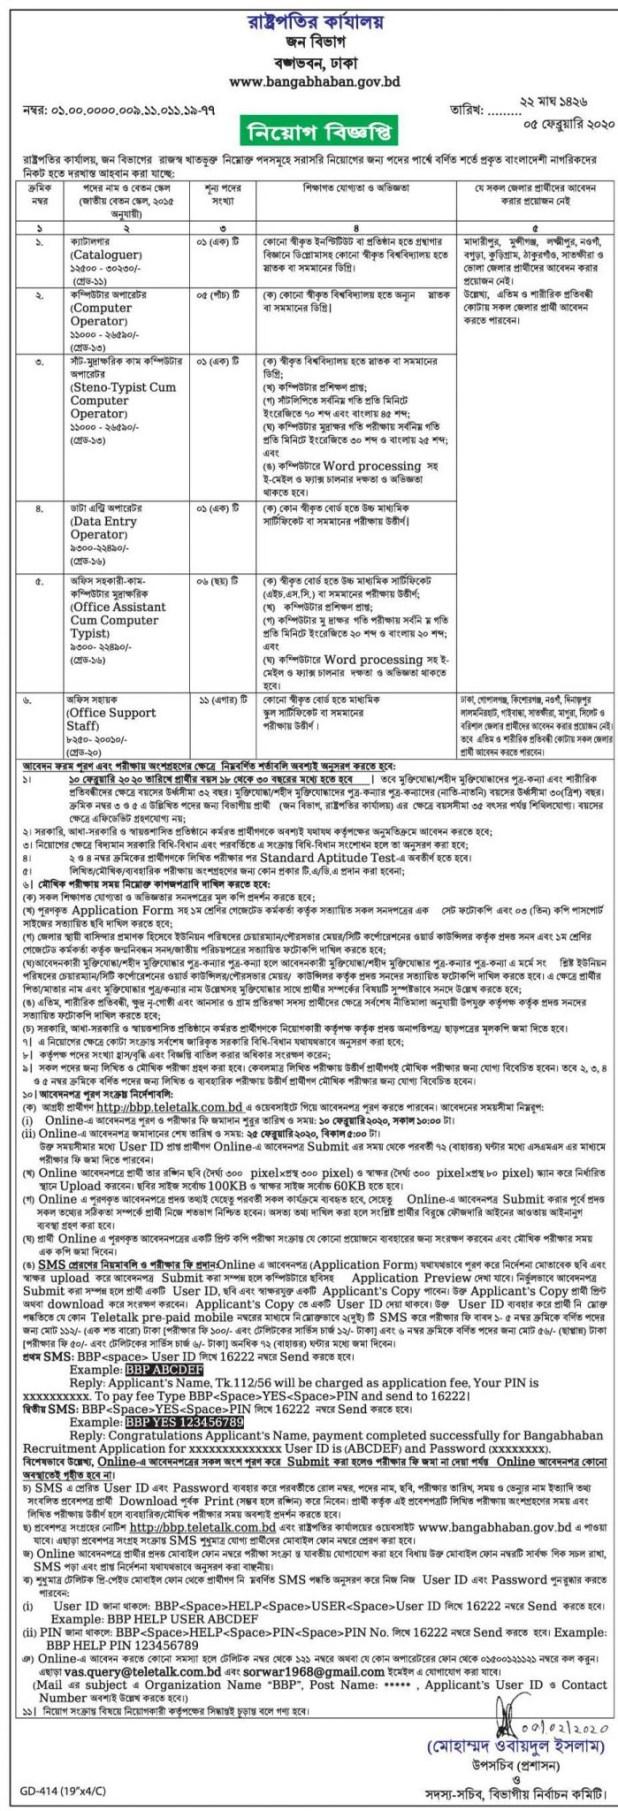 Bangabhaban Job Circular 2020- bangabhaban.gov.bd